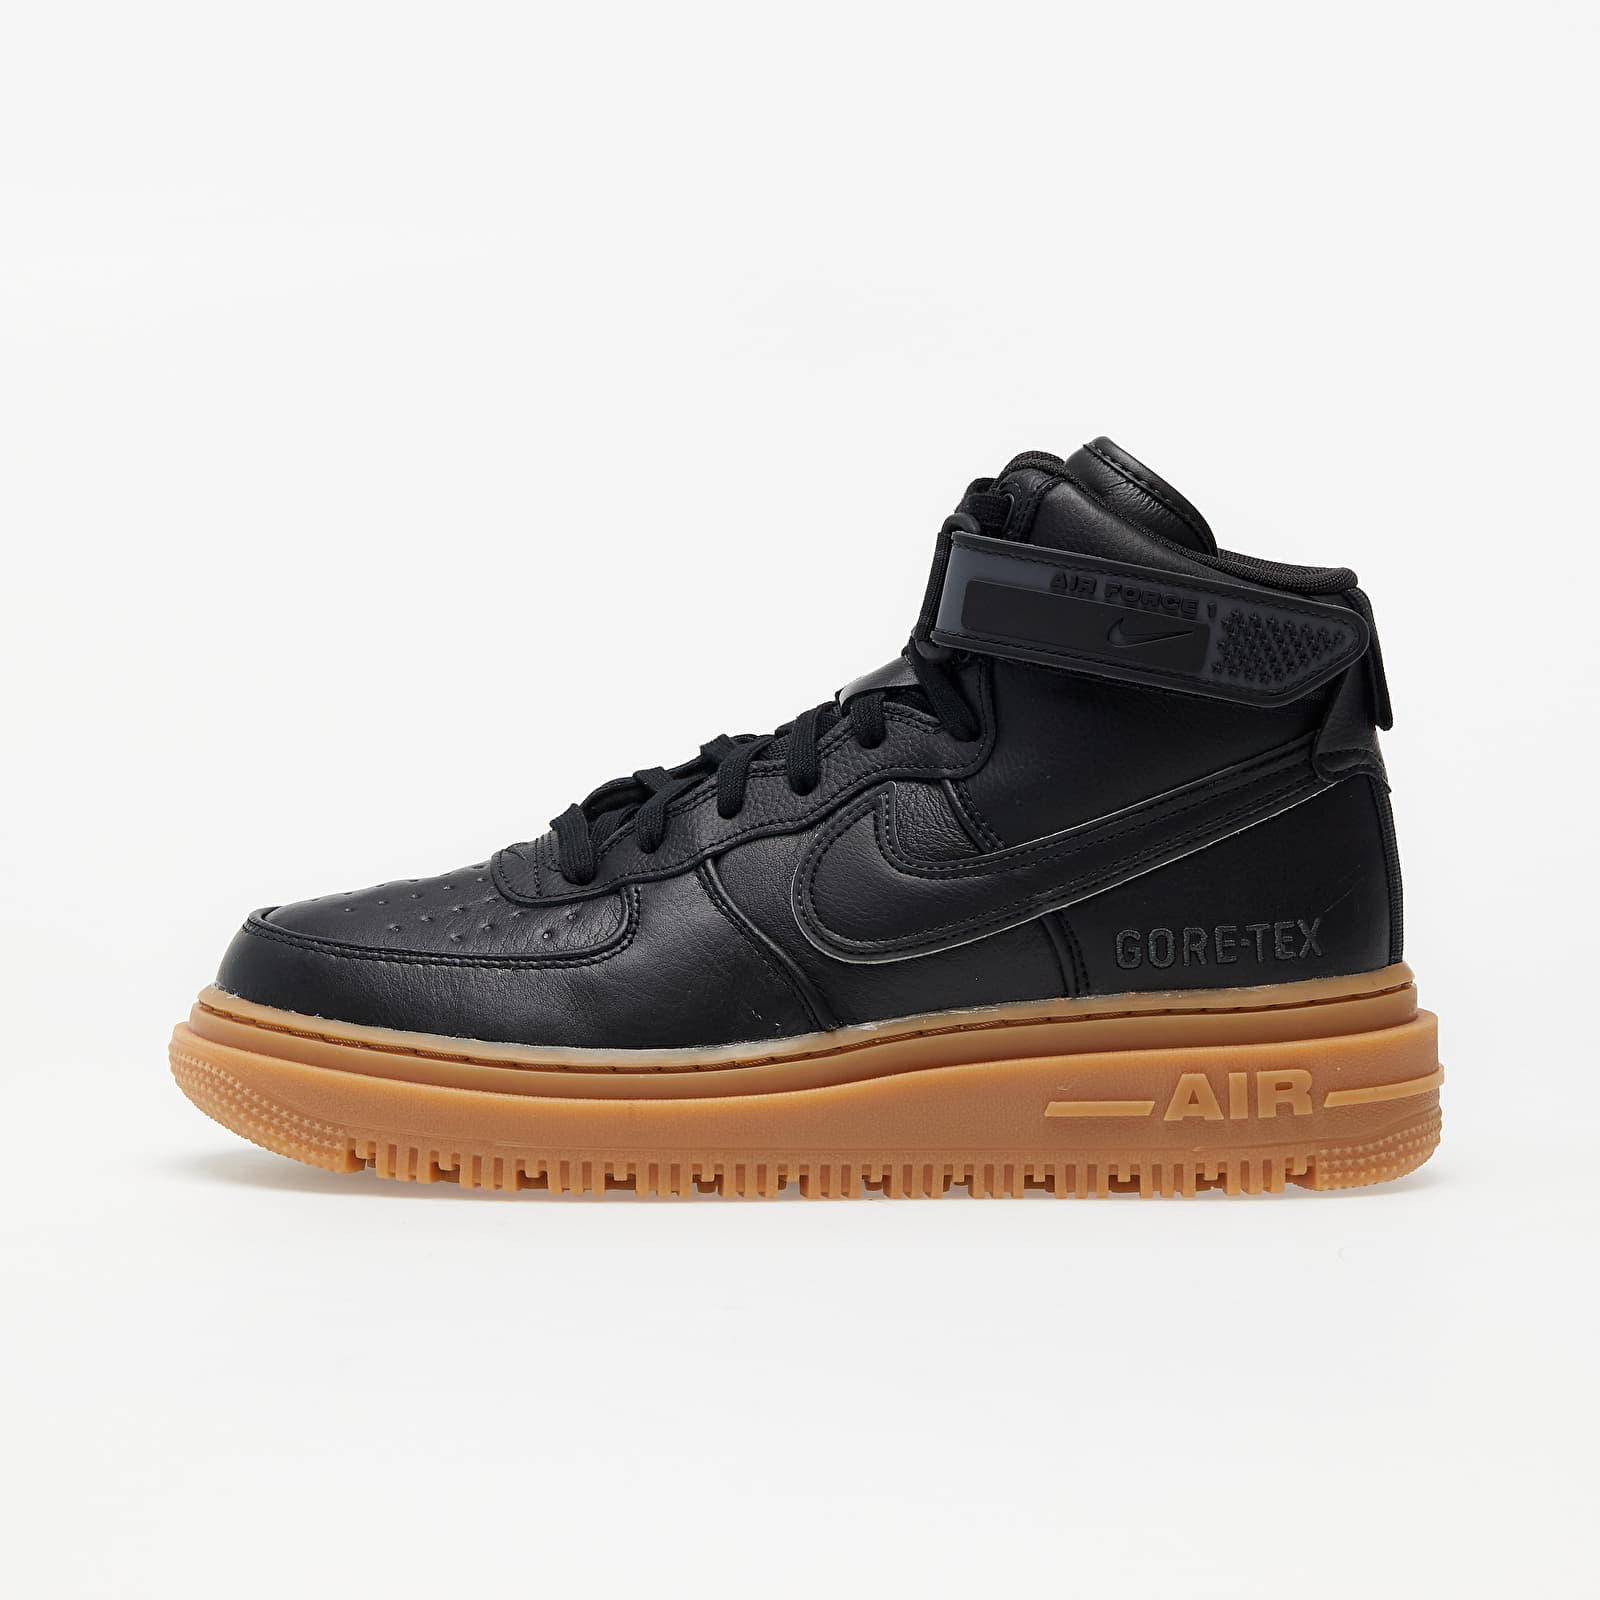 Pánske tenisky a topánky Nike Air Force 1 Gore-Tex Boot Black/ Black-Anthracite-Gum Med Brown